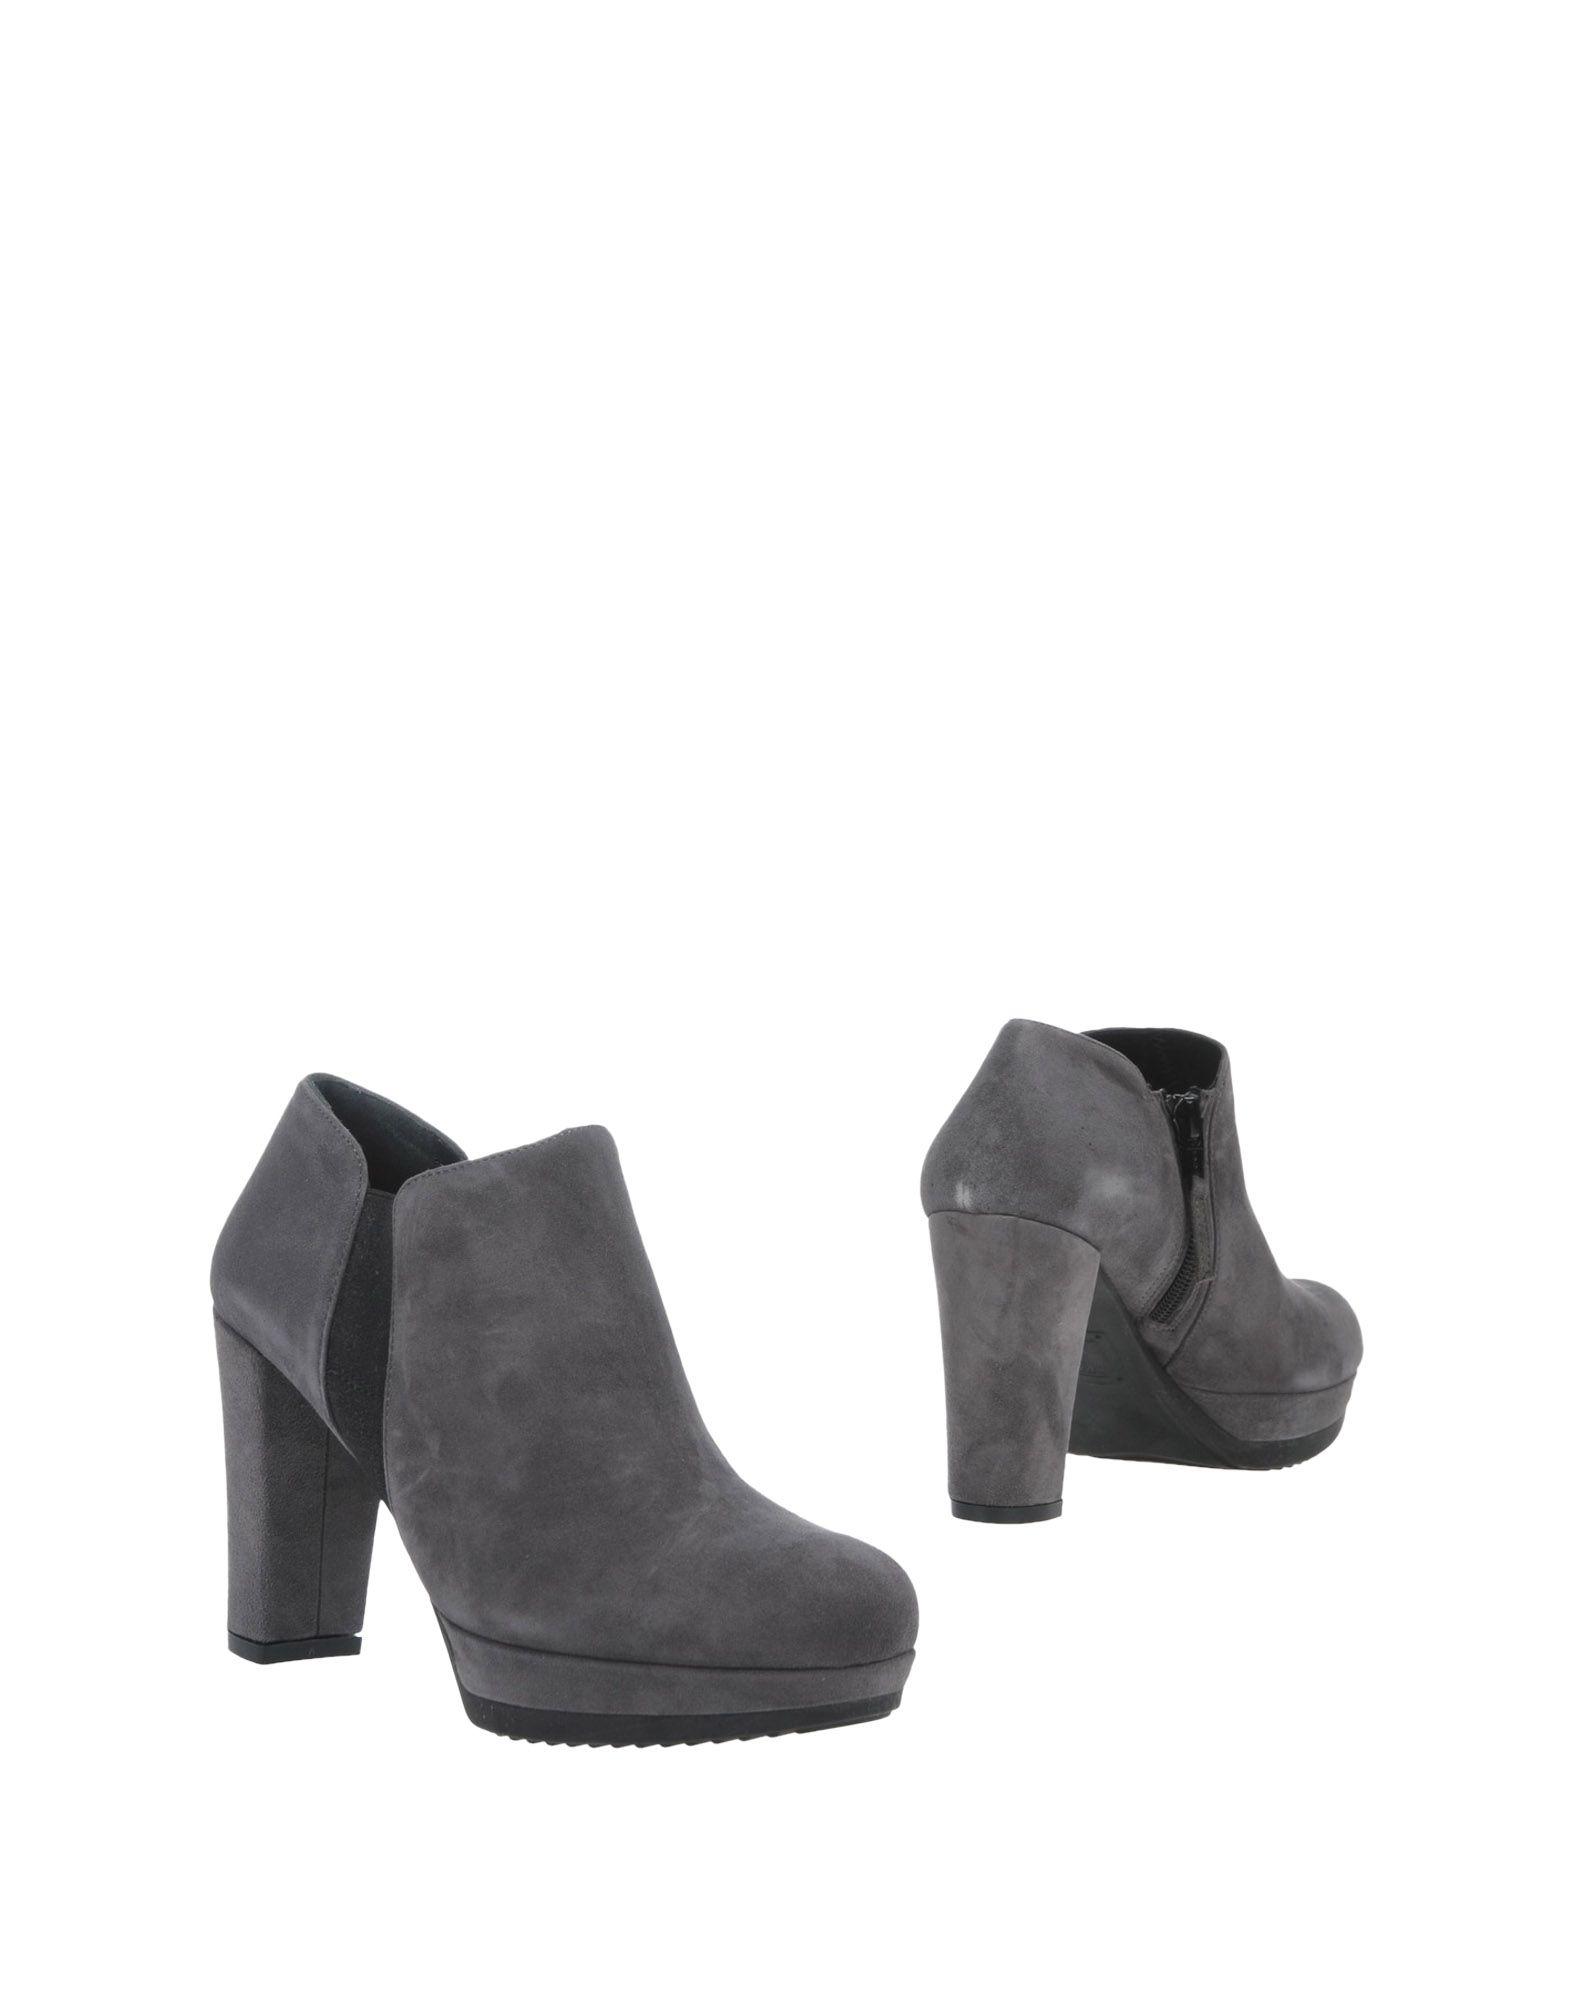 Andrea Schuhe Morelli Stiefelette Damen  11301632TW Gute Qualität beliebte Schuhe Andrea b18487